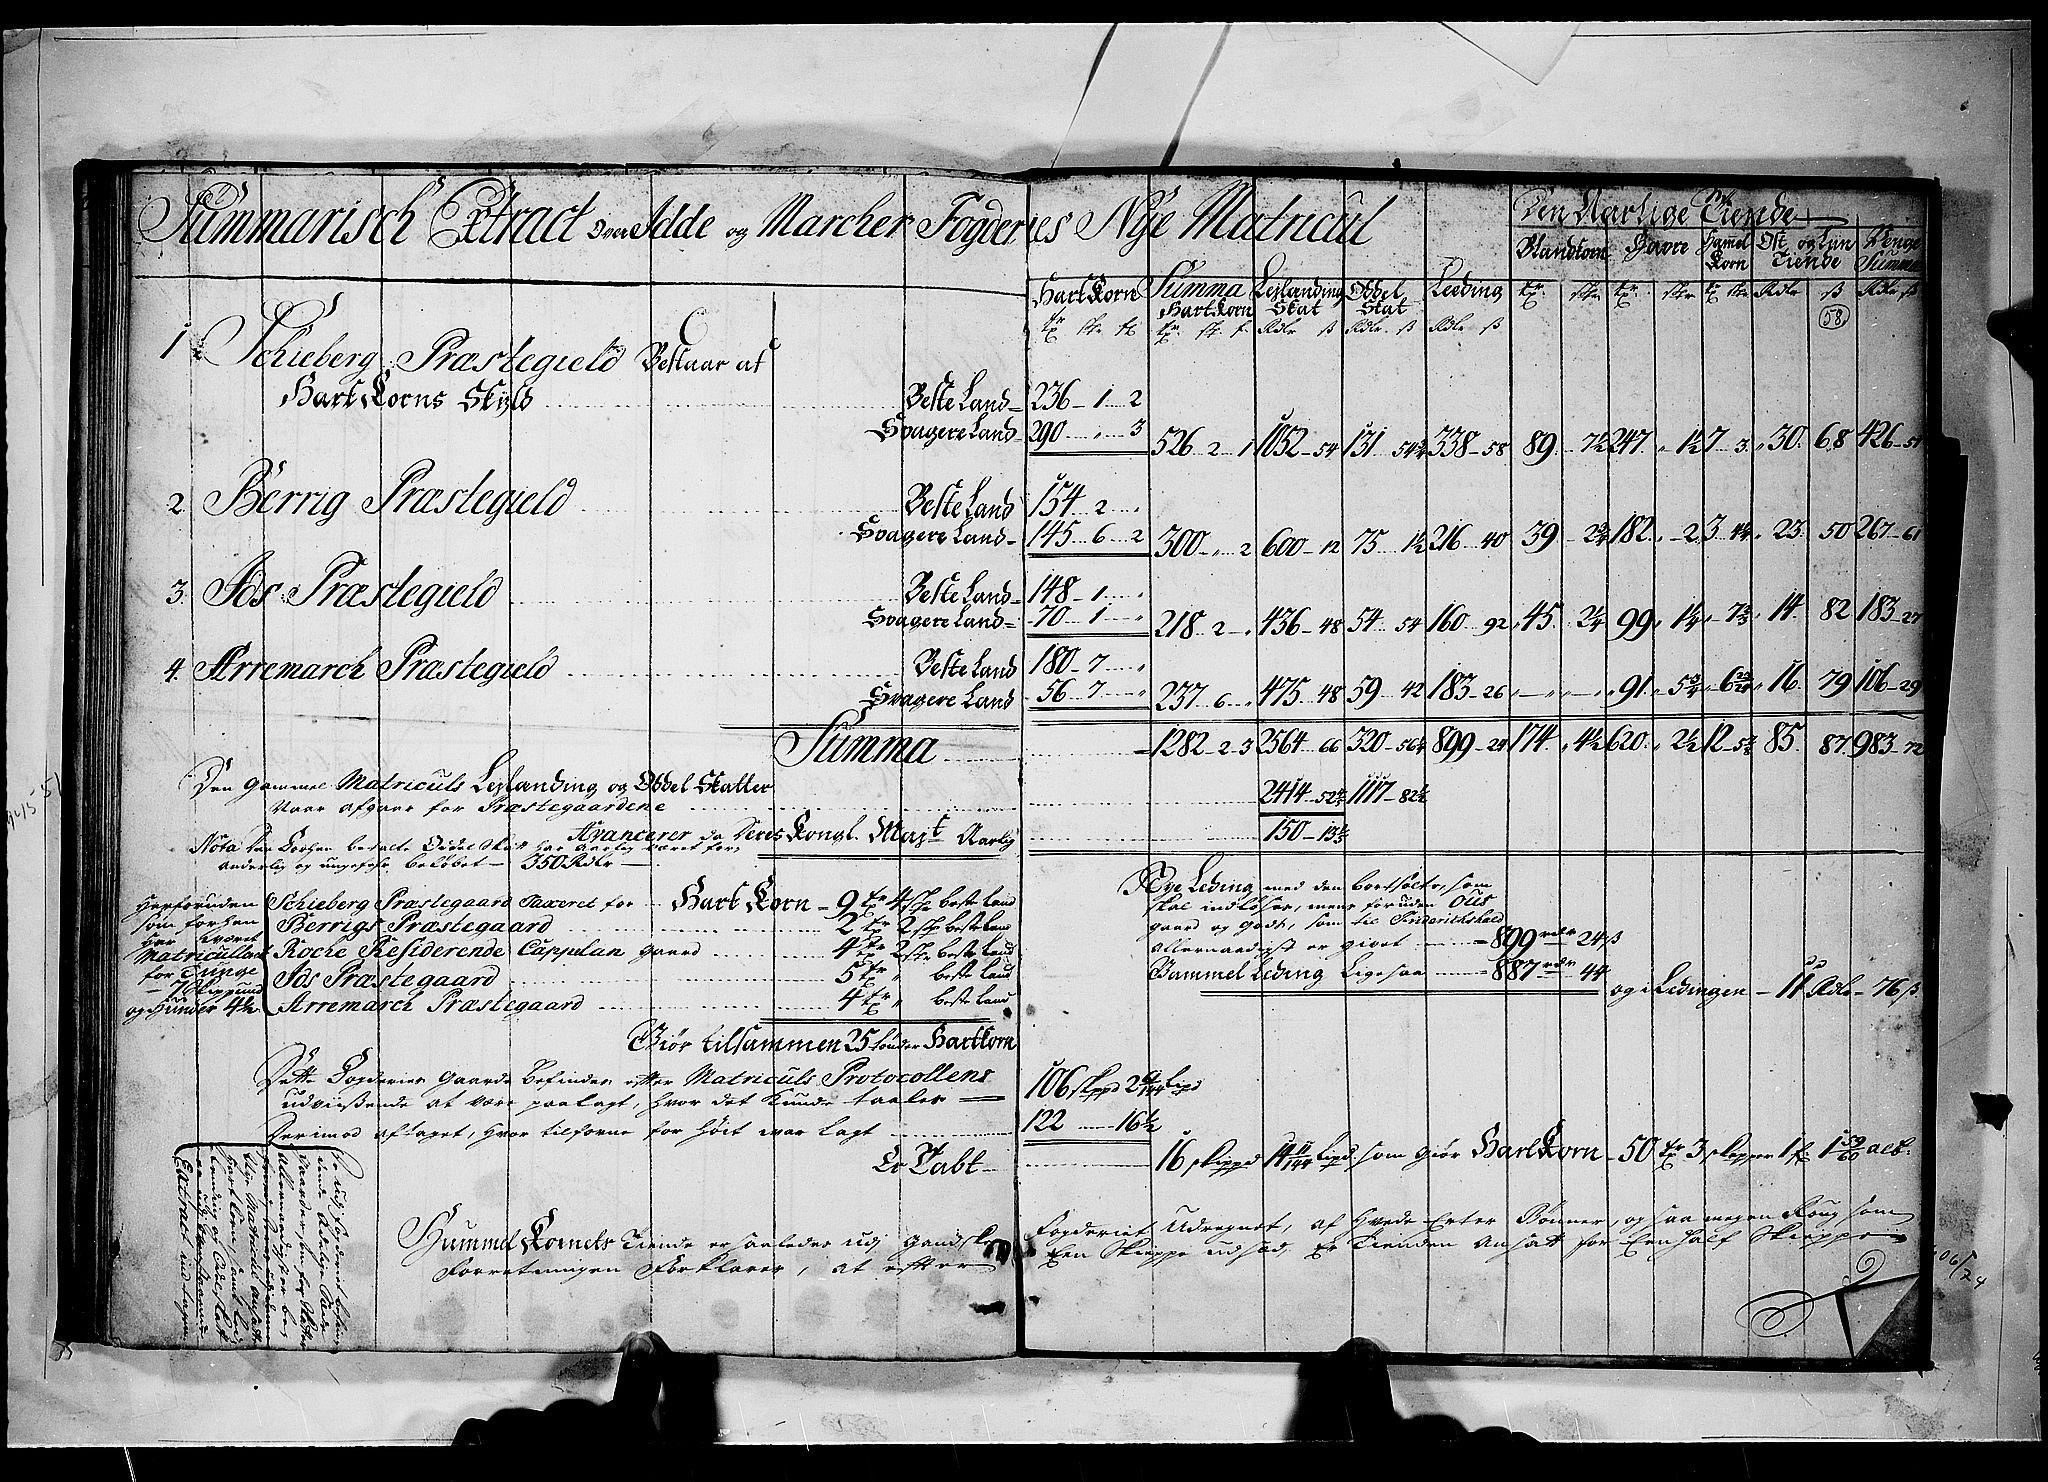 RA, Rentekammeret inntil 1814, Realistisk ordnet avdeling, N/Nb/Nbf/L0098: Idd og Marker matrikkelprotokoll, 1723, s. 57b-58a